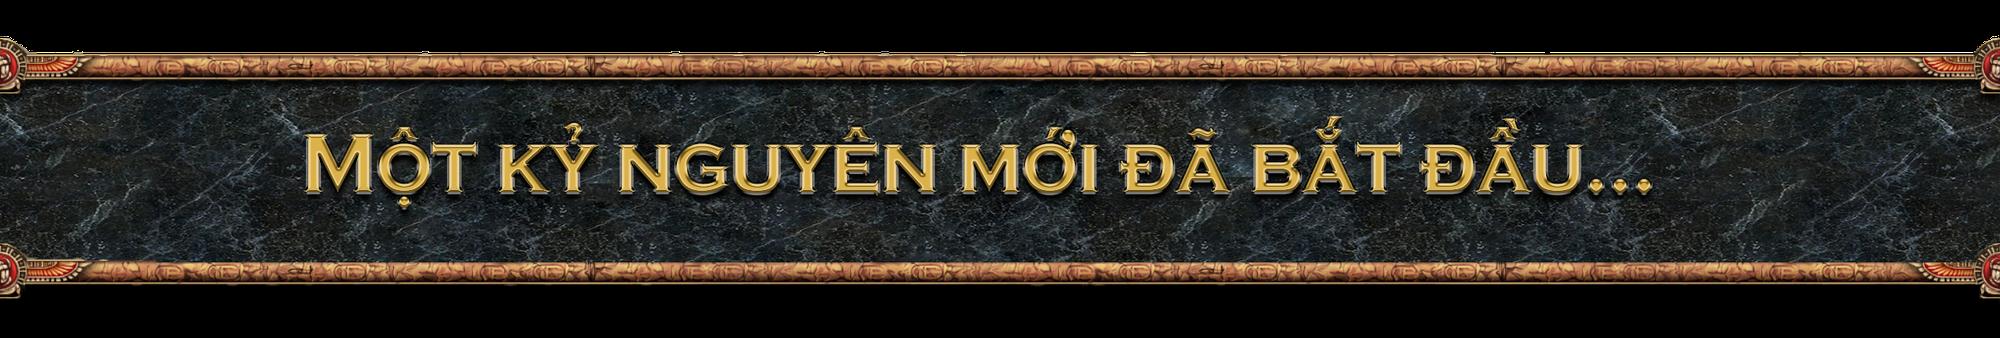 Age of Empires: Definitive Edition - Thay đổi hay là chết… - Ảnh 16.